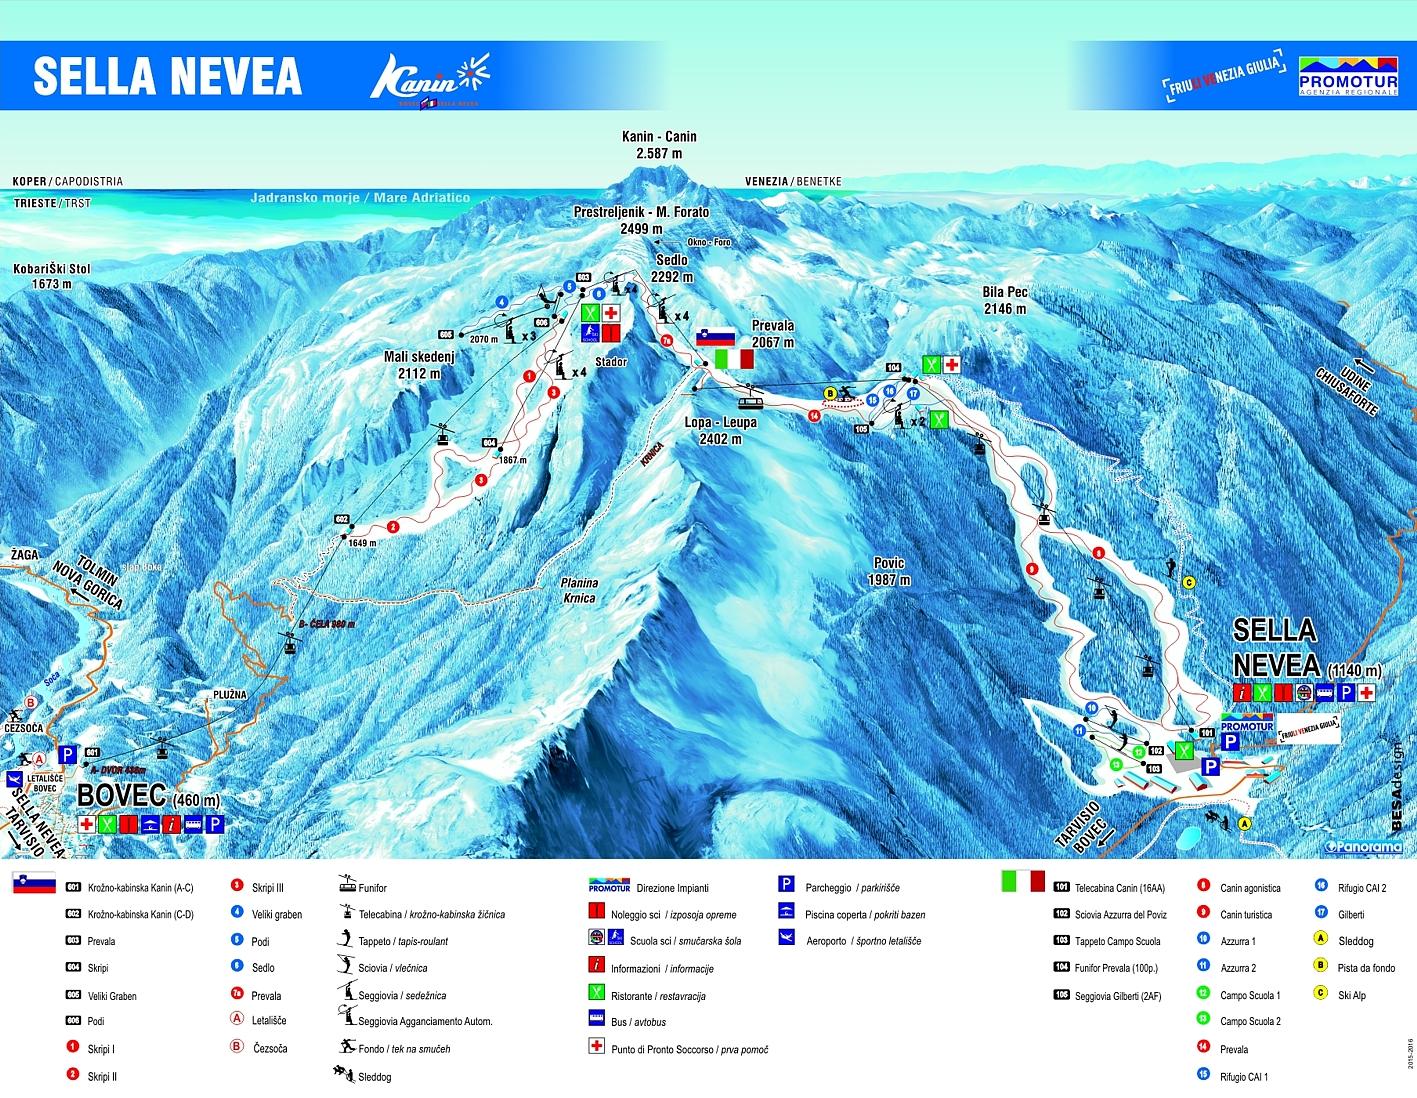 Mappa Piste Sella Nevea